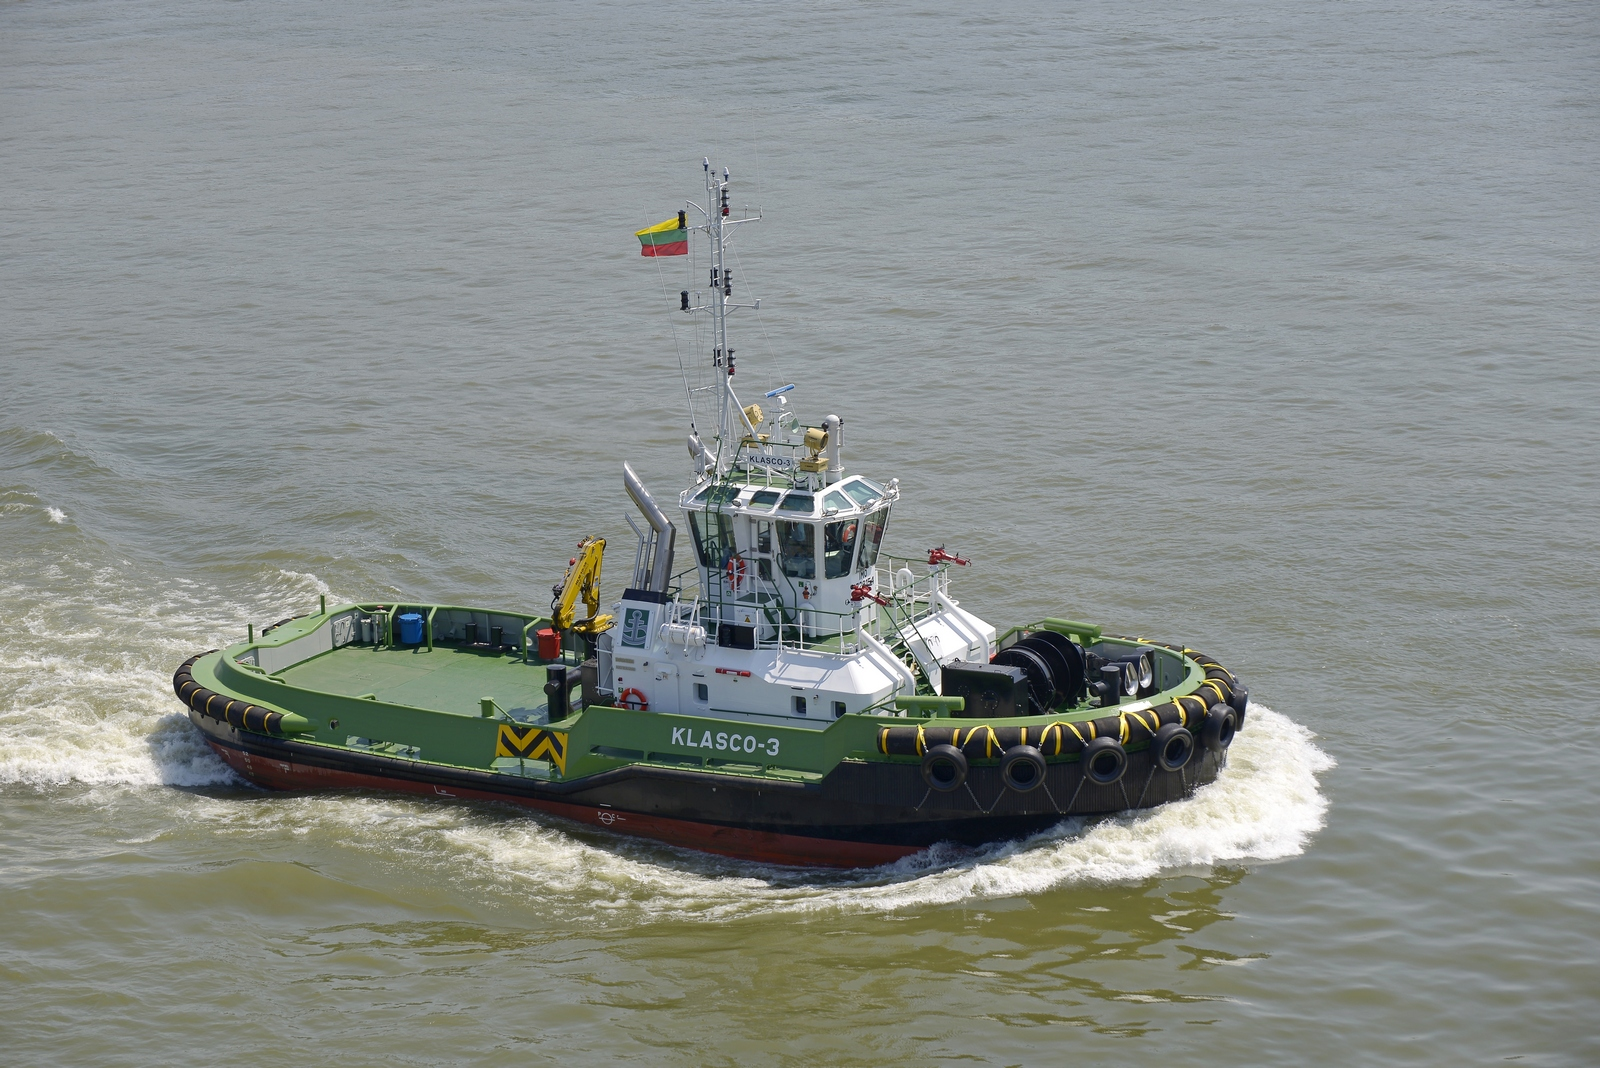 Damen delivers ASD Tug 2810 ICE to Klasco, Lithuania